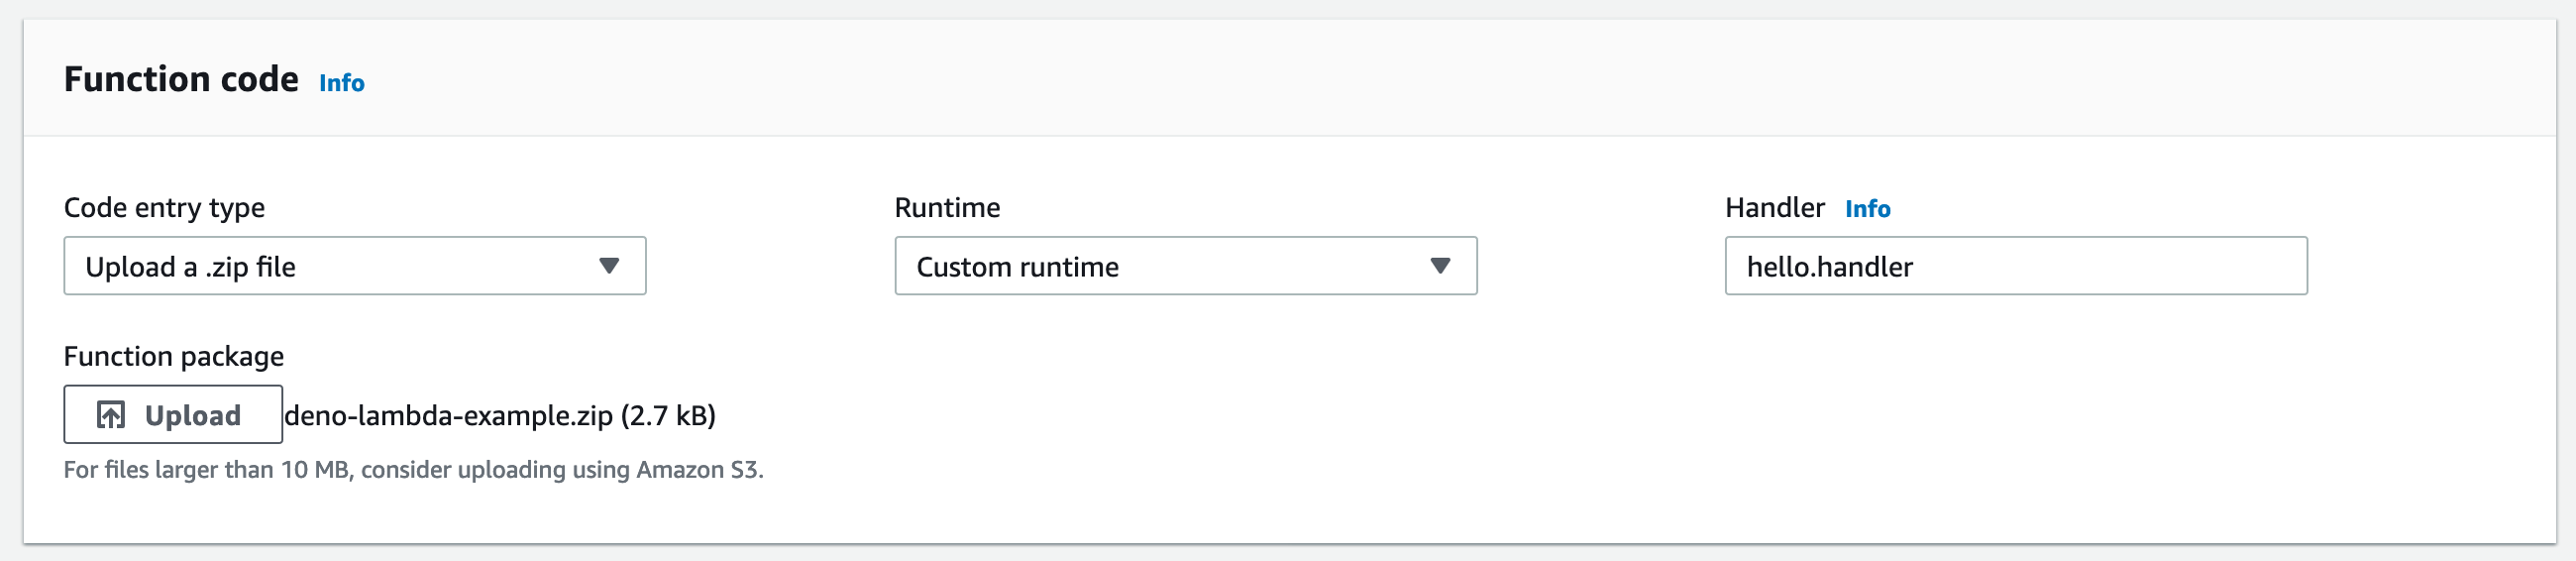 Upload function code